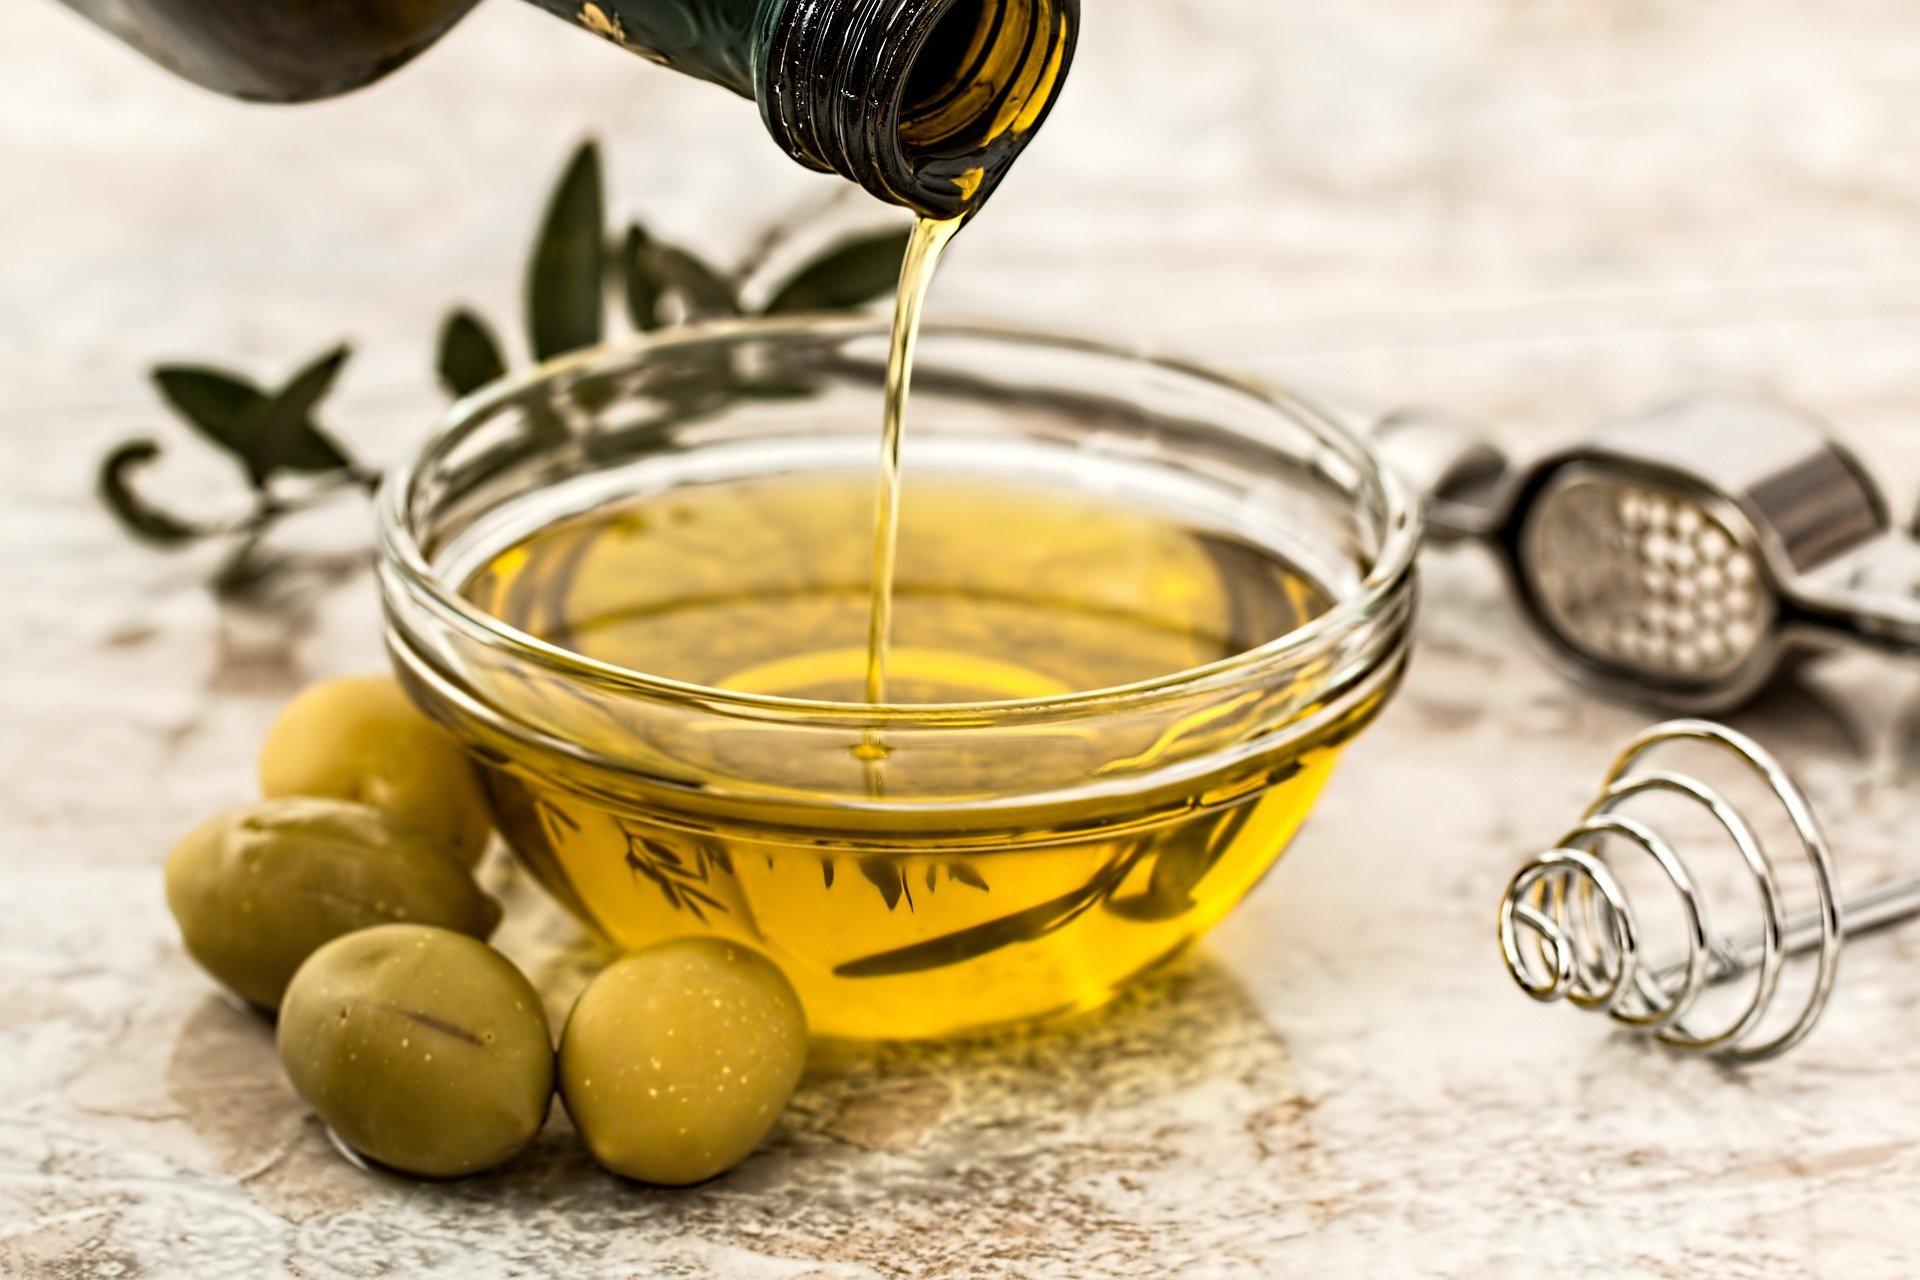 Aceite de oliva industri agroalimentaria